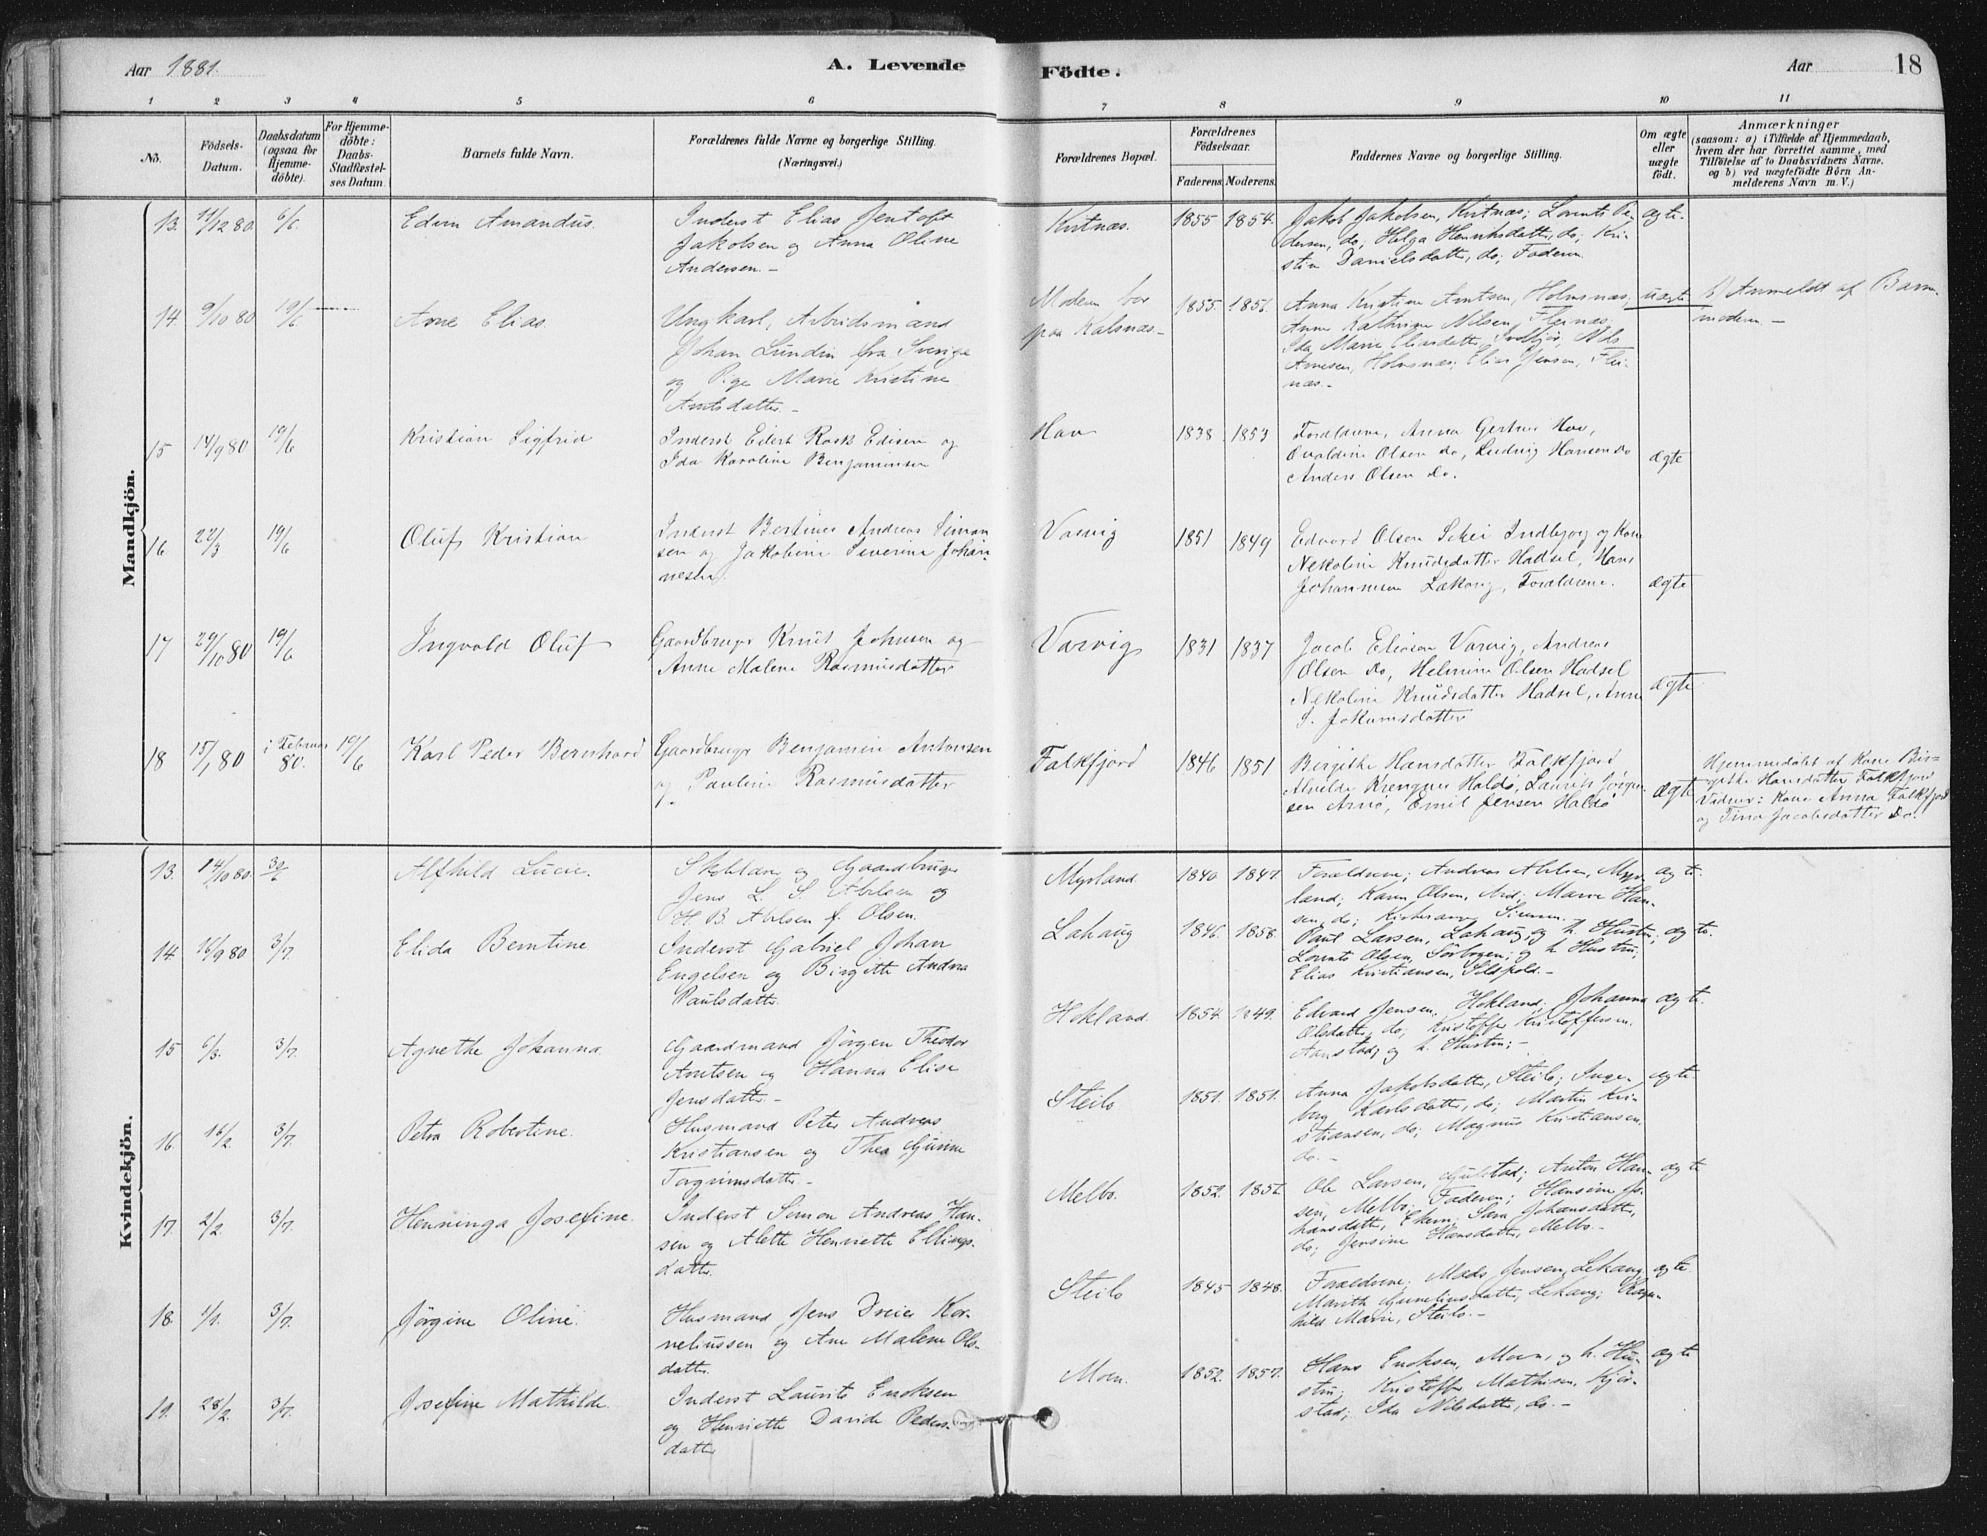 SAT, Ministerialprotokoller, klokkerbøker og fødselsregistre - Nordland, 888/L1244: Ministerialbok nr. 888A10, 1880-1890, s. 18